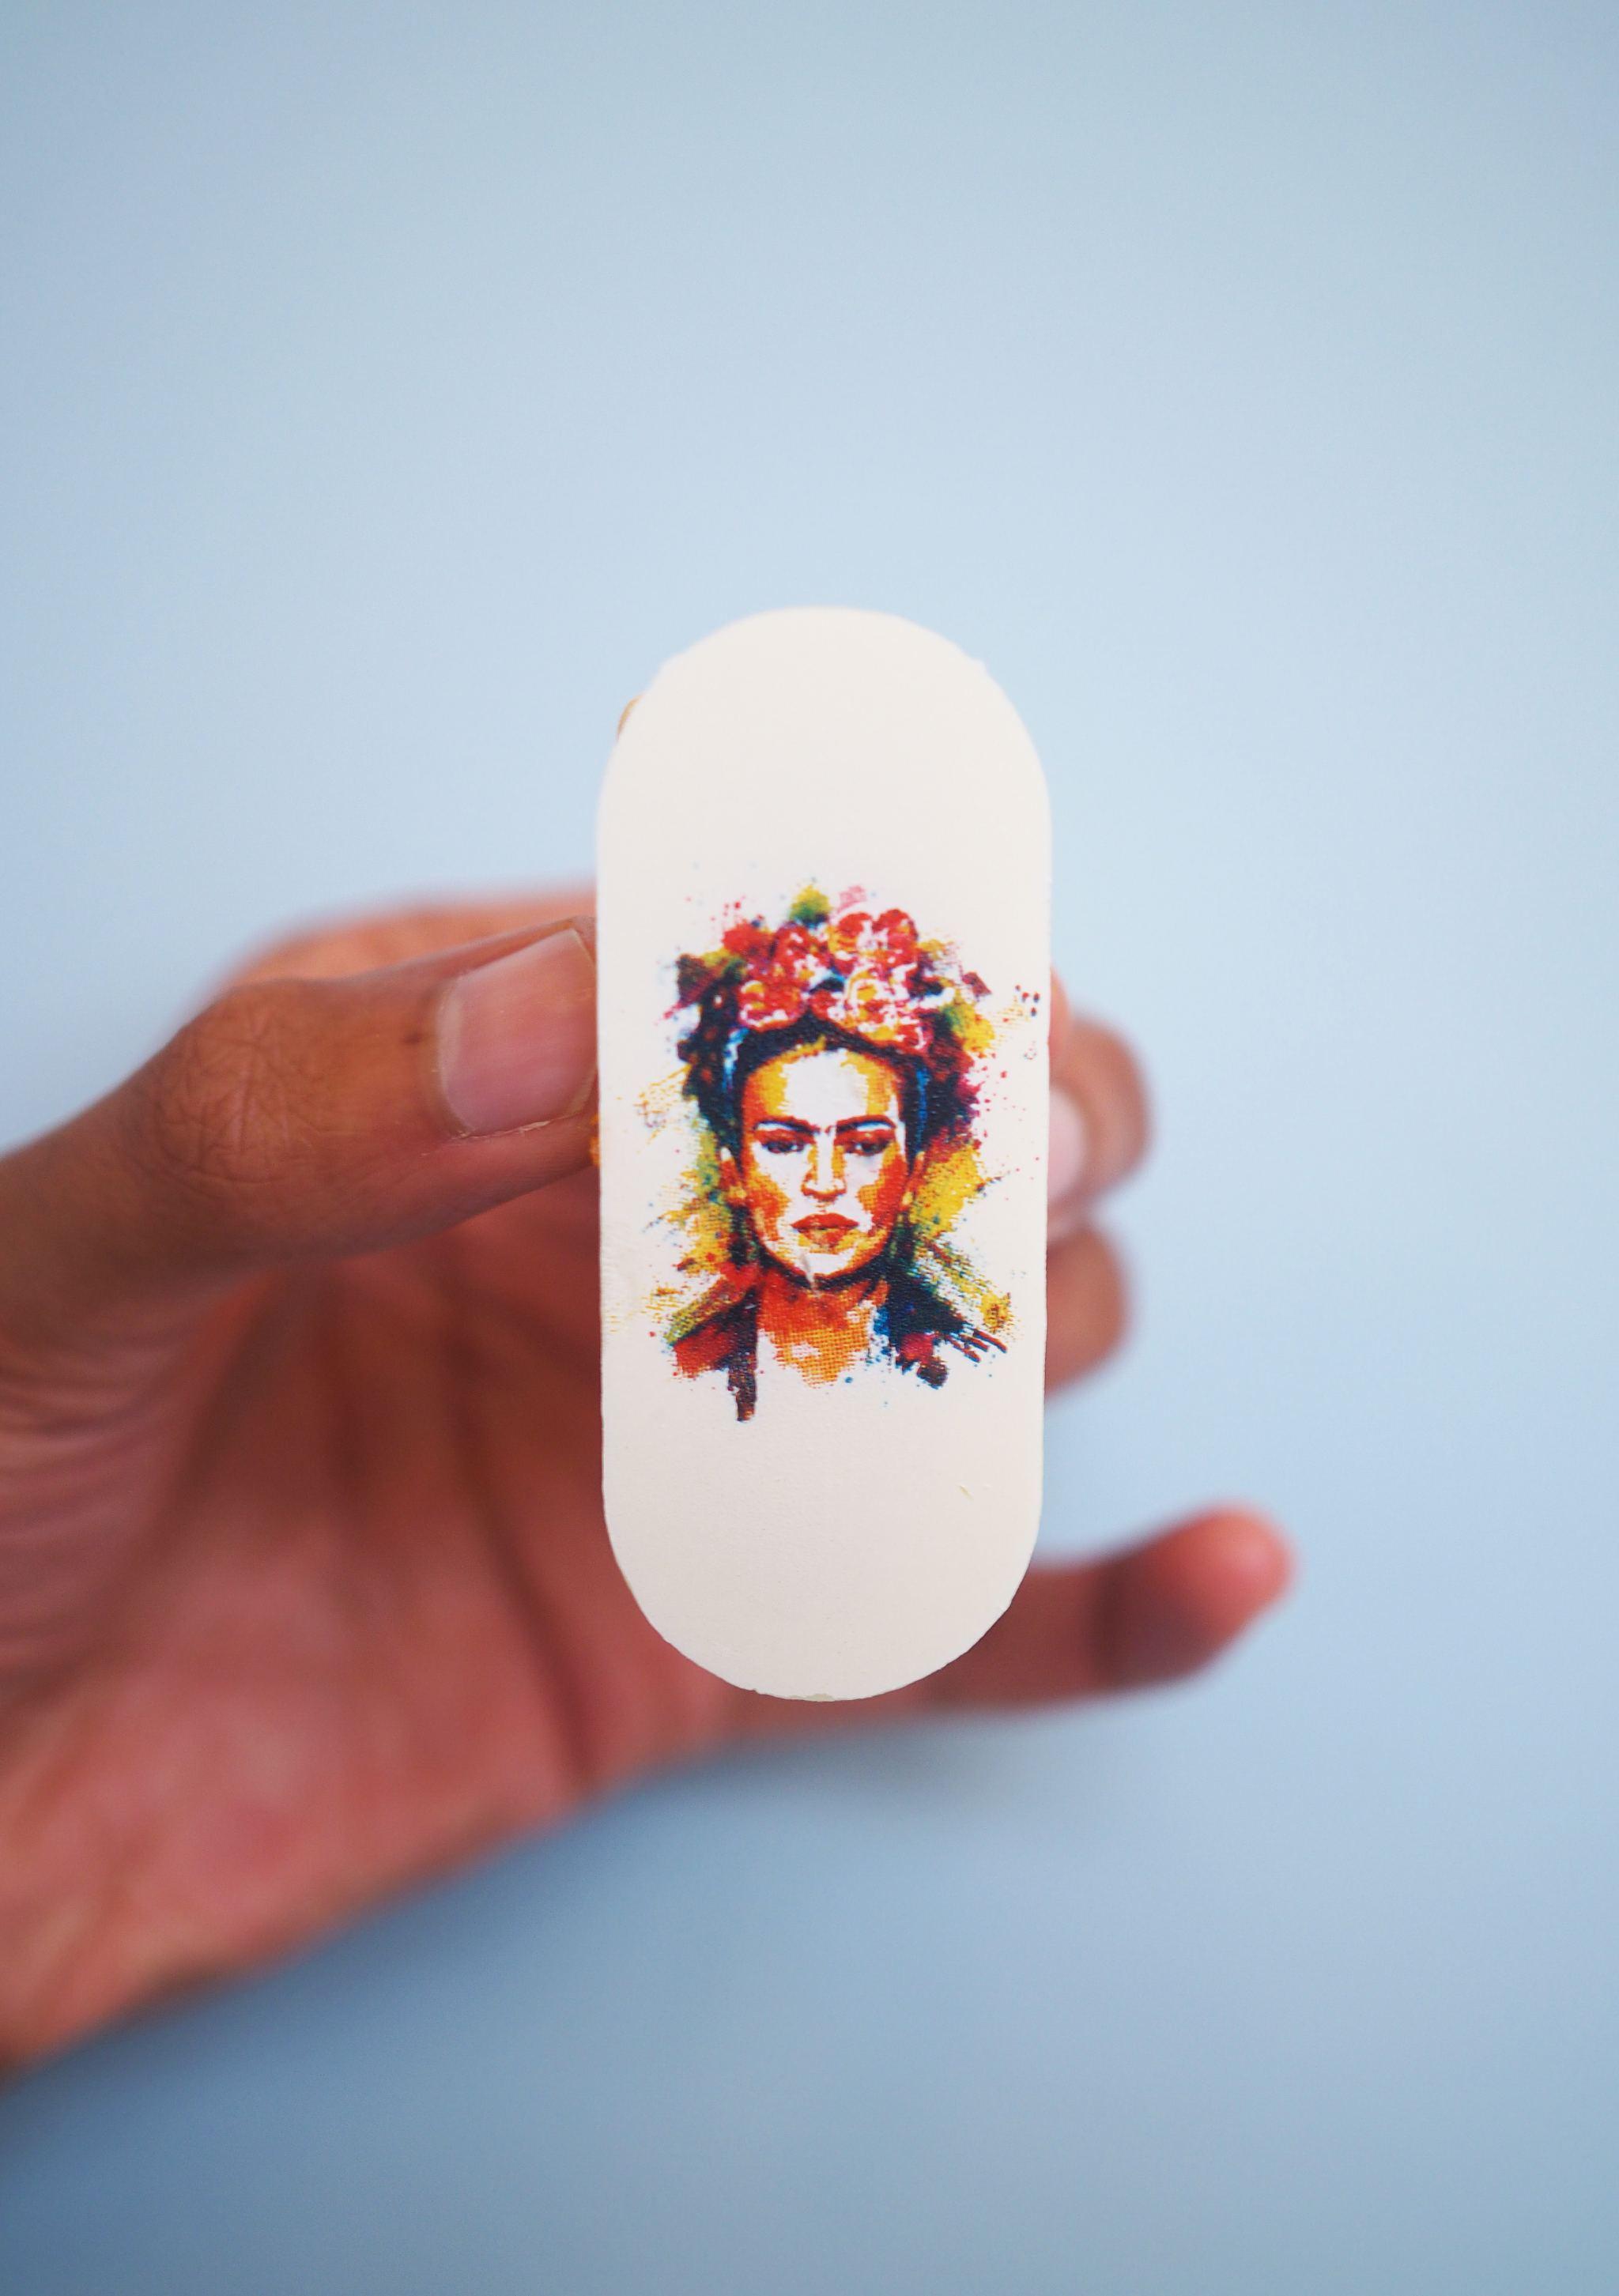 The Lanesborough - Frida Kahlo Afternoon Tea